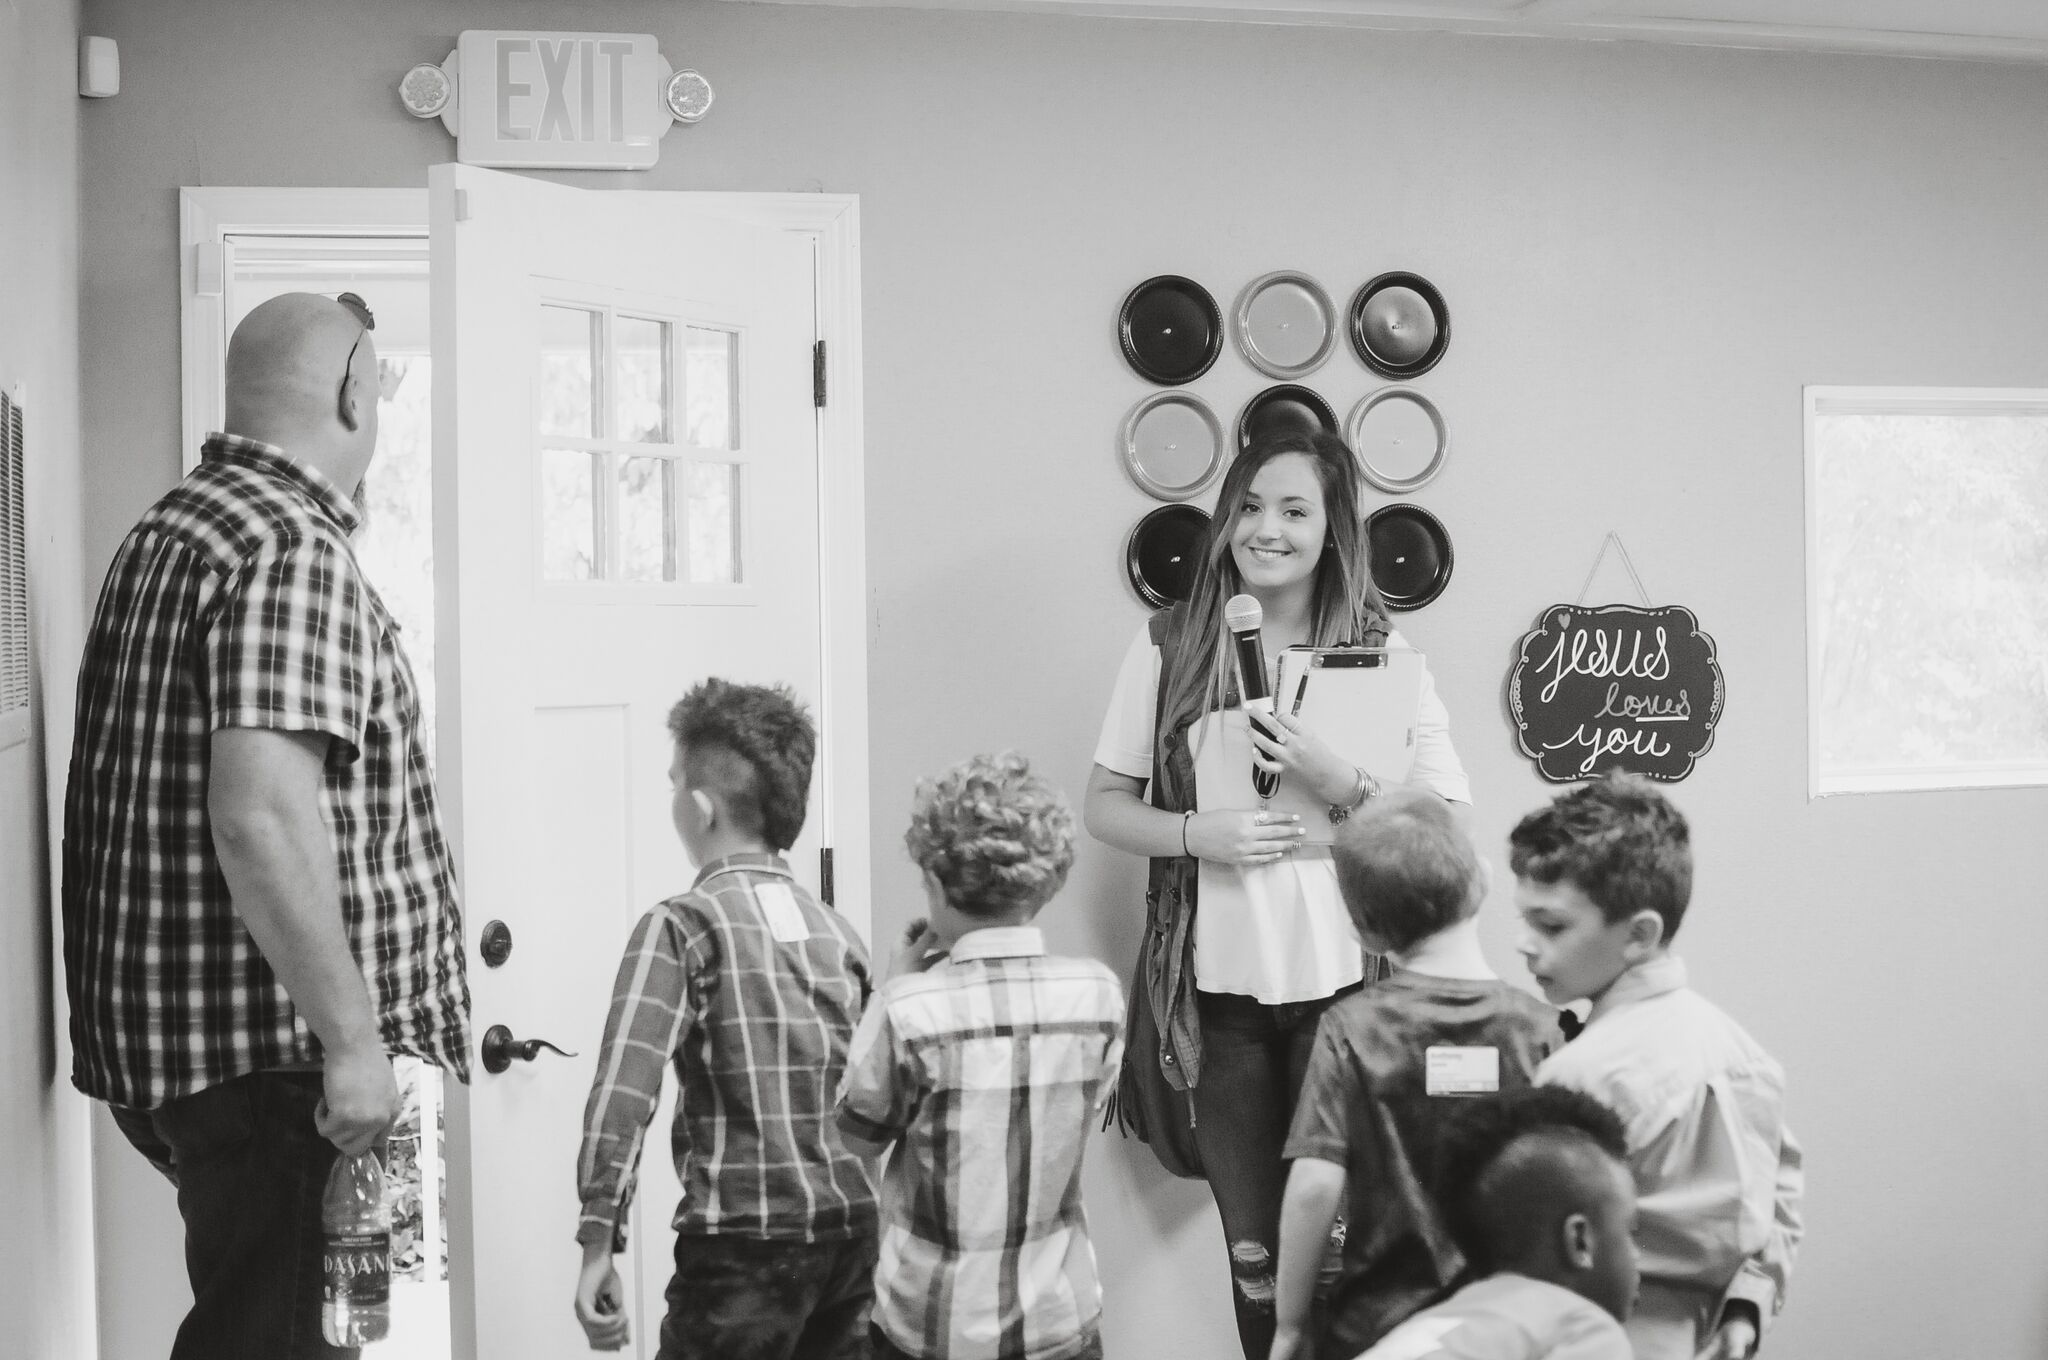 LIFEGATE KIDS - TEACHERS + REGISTRATION + SECURITY